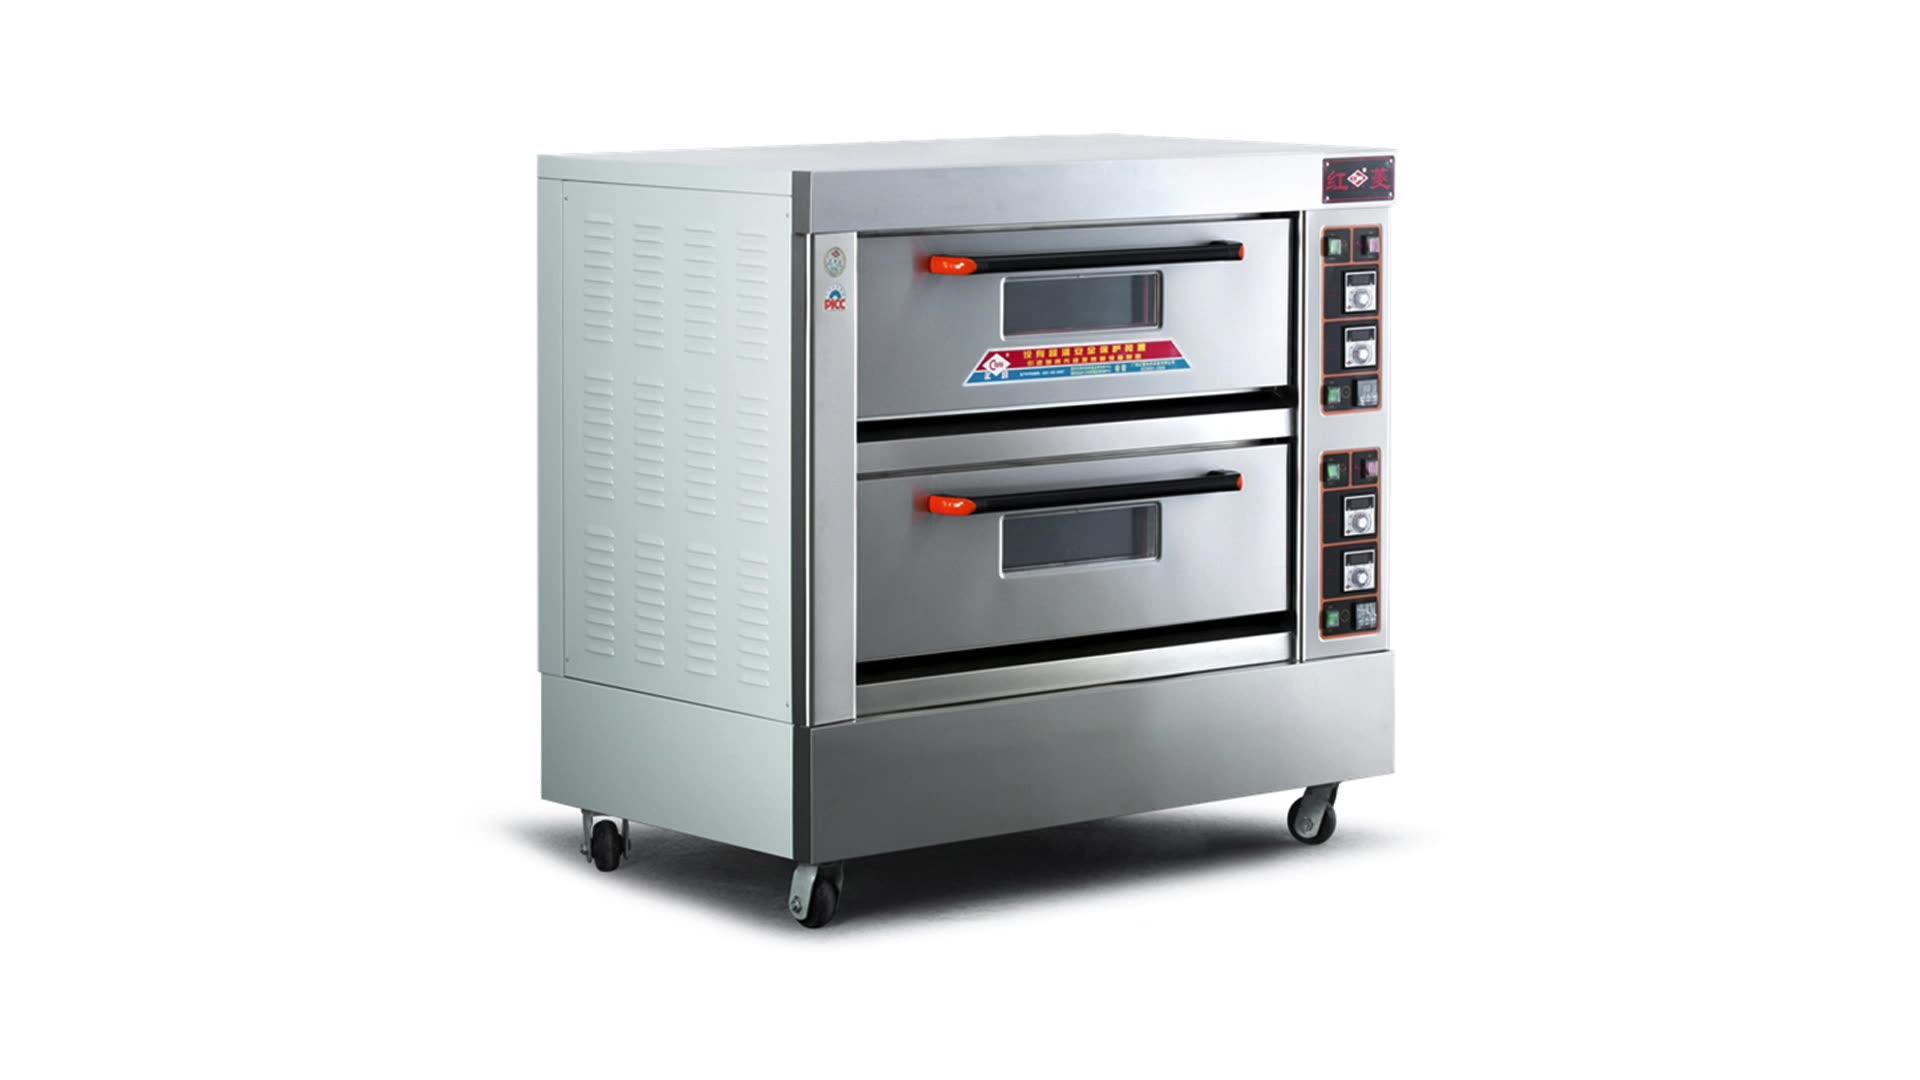 Best electric oven for baking blanco quatrus